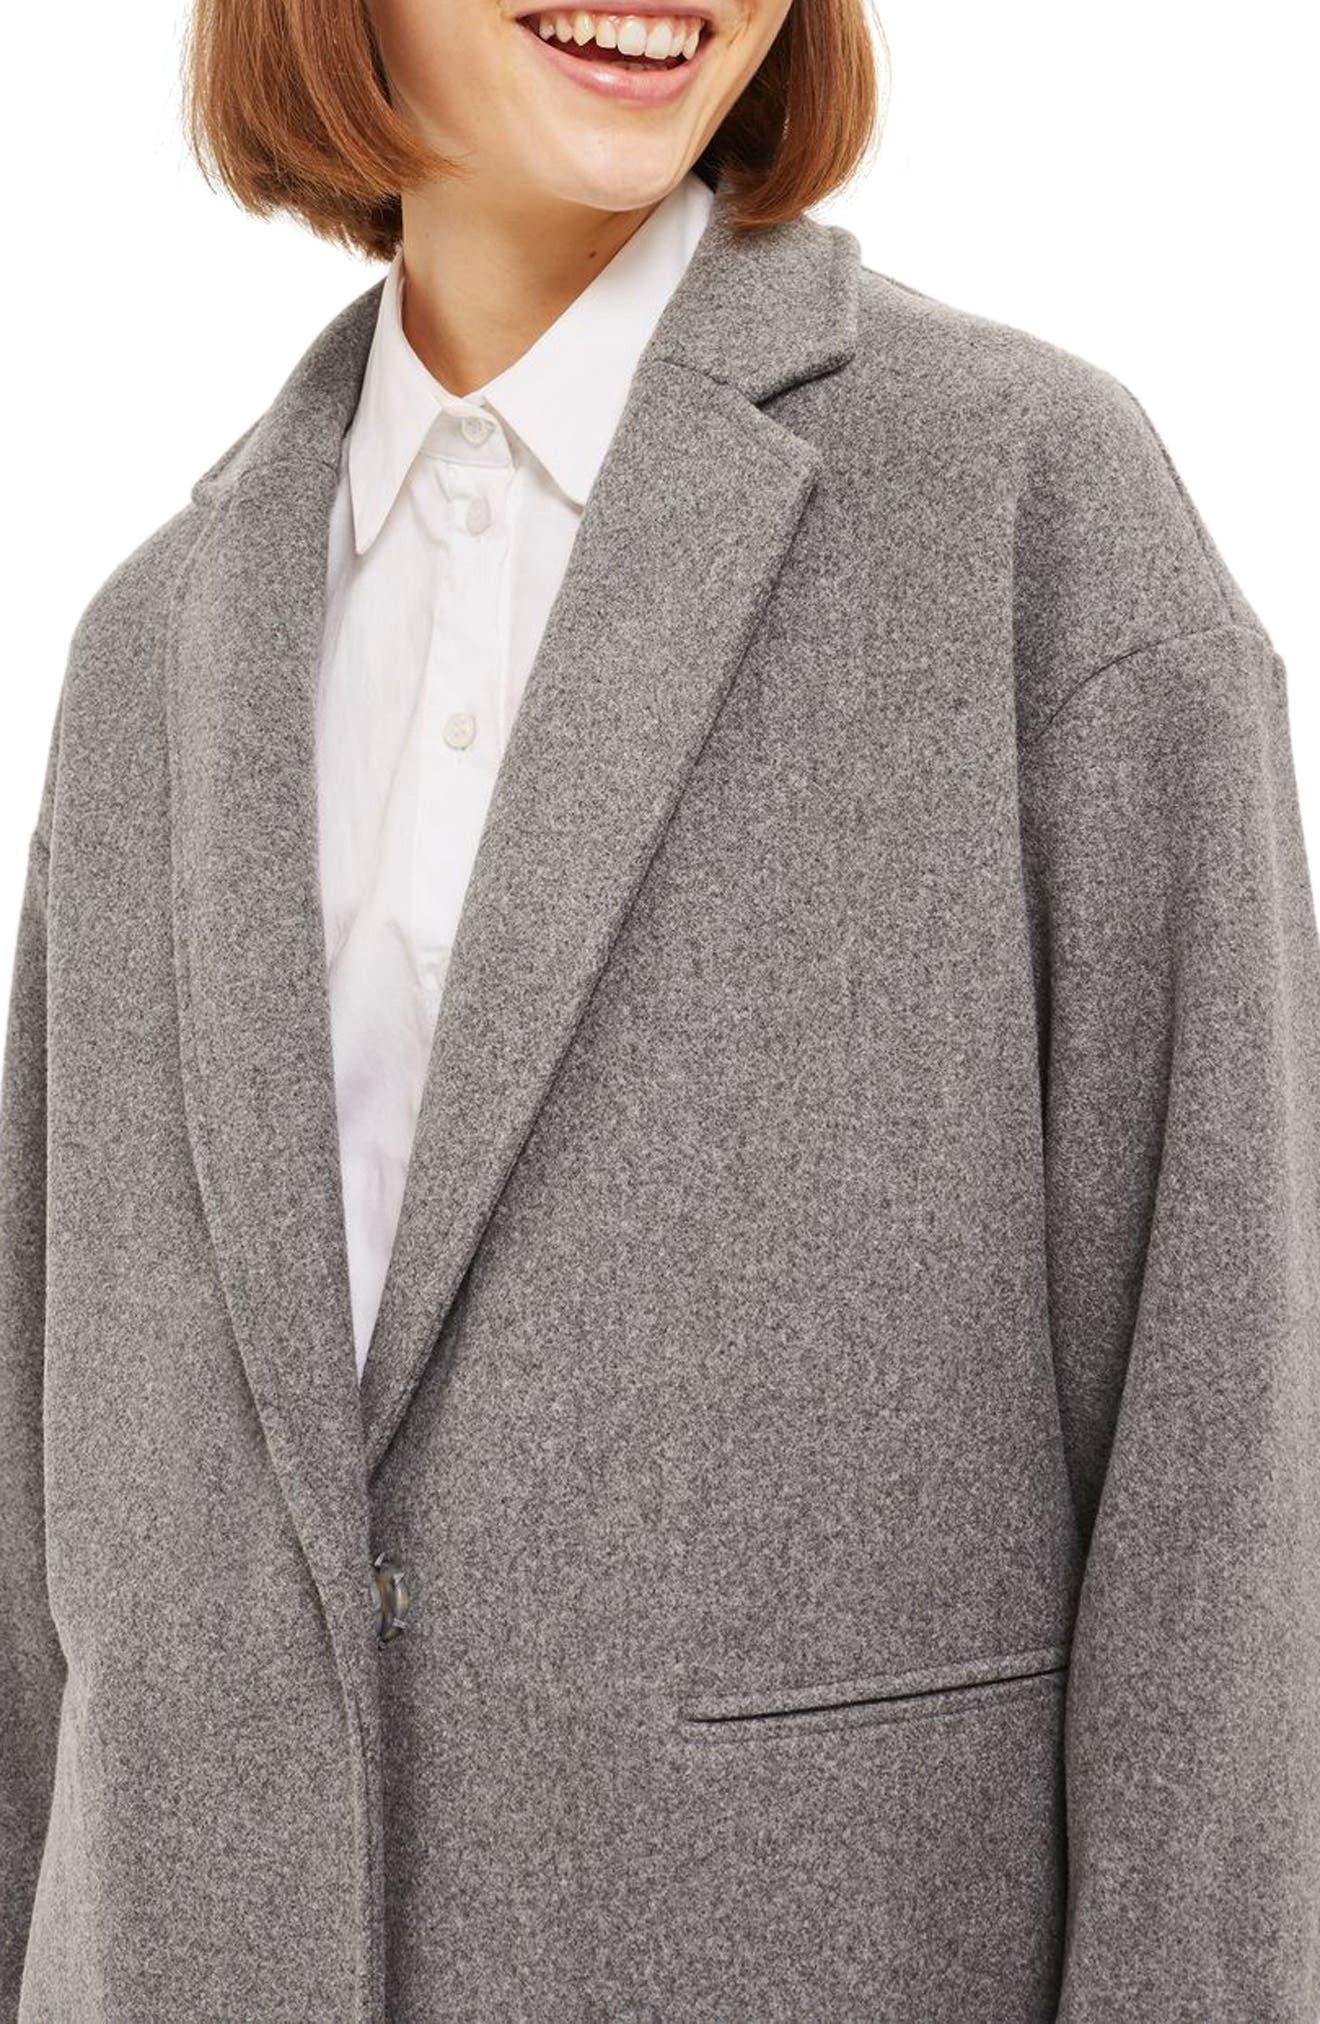 Bonded Knit Coat,                             Alternate thumbnail 3, color,                             Grey